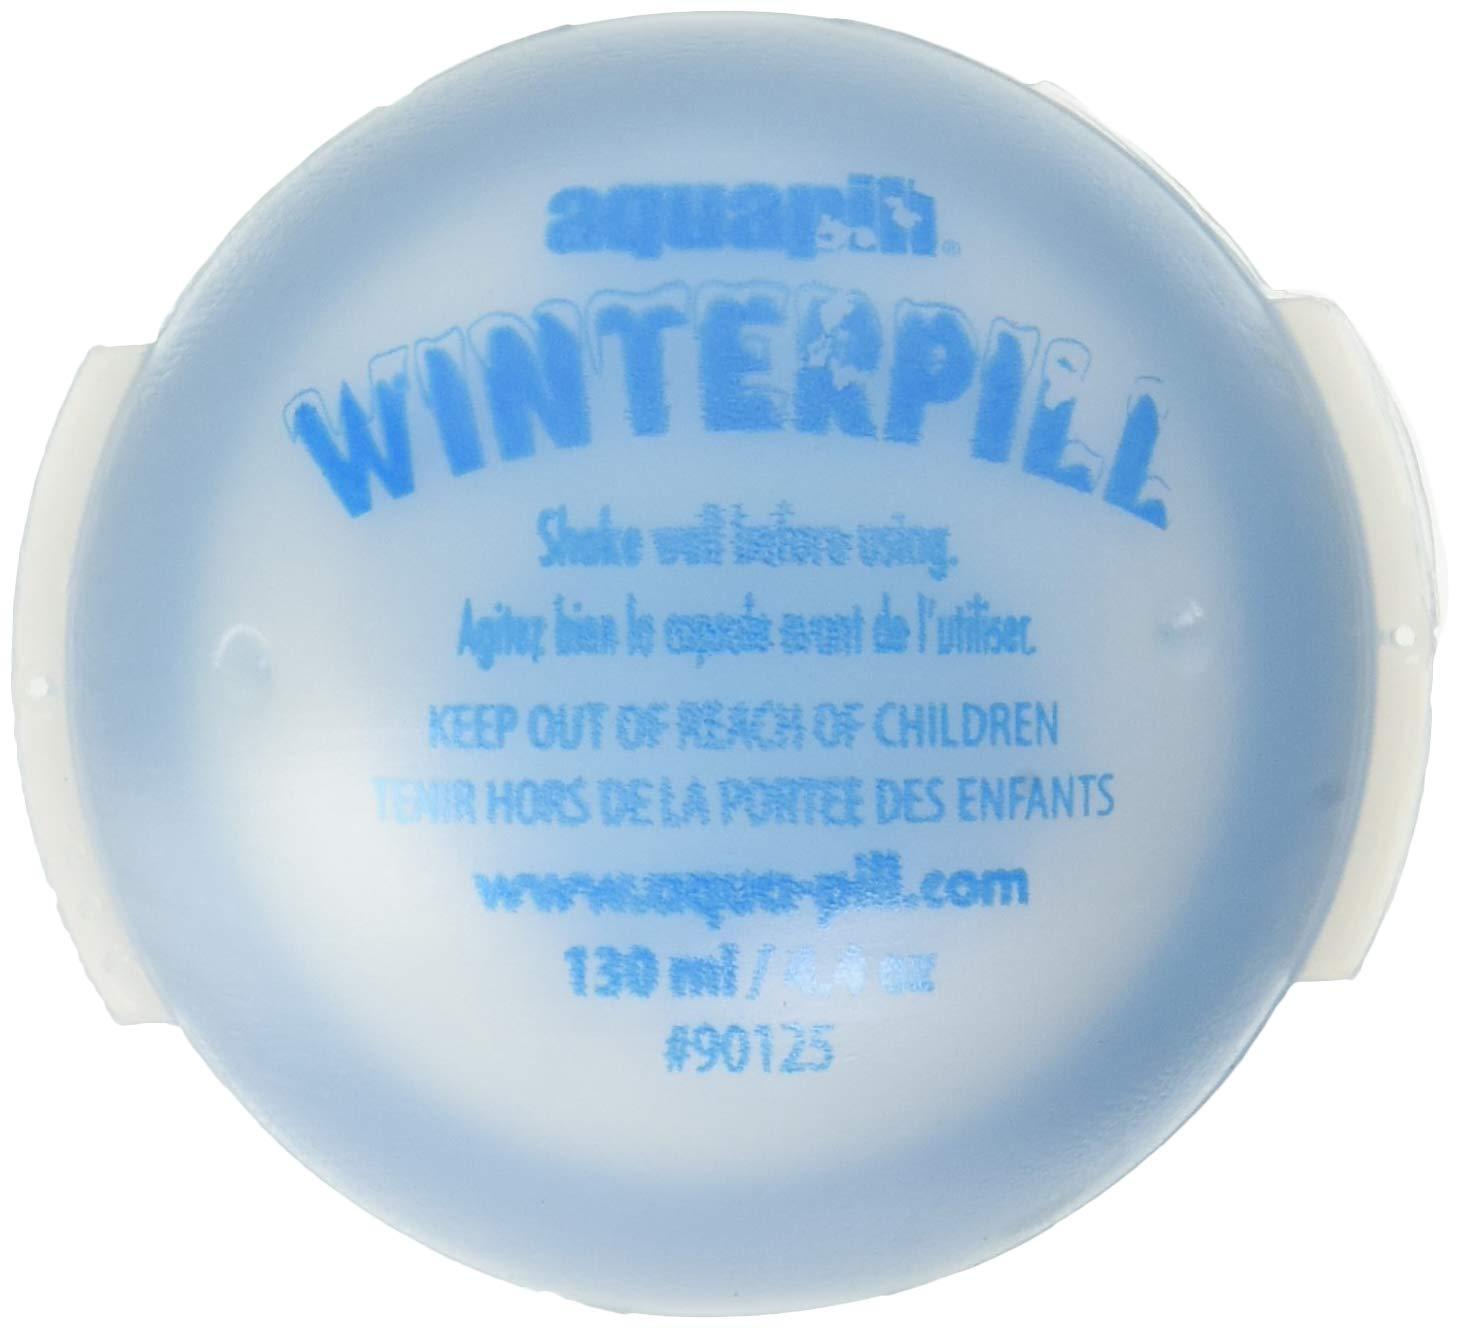 Amazon.com: Aquapill–winterpill 2 ...